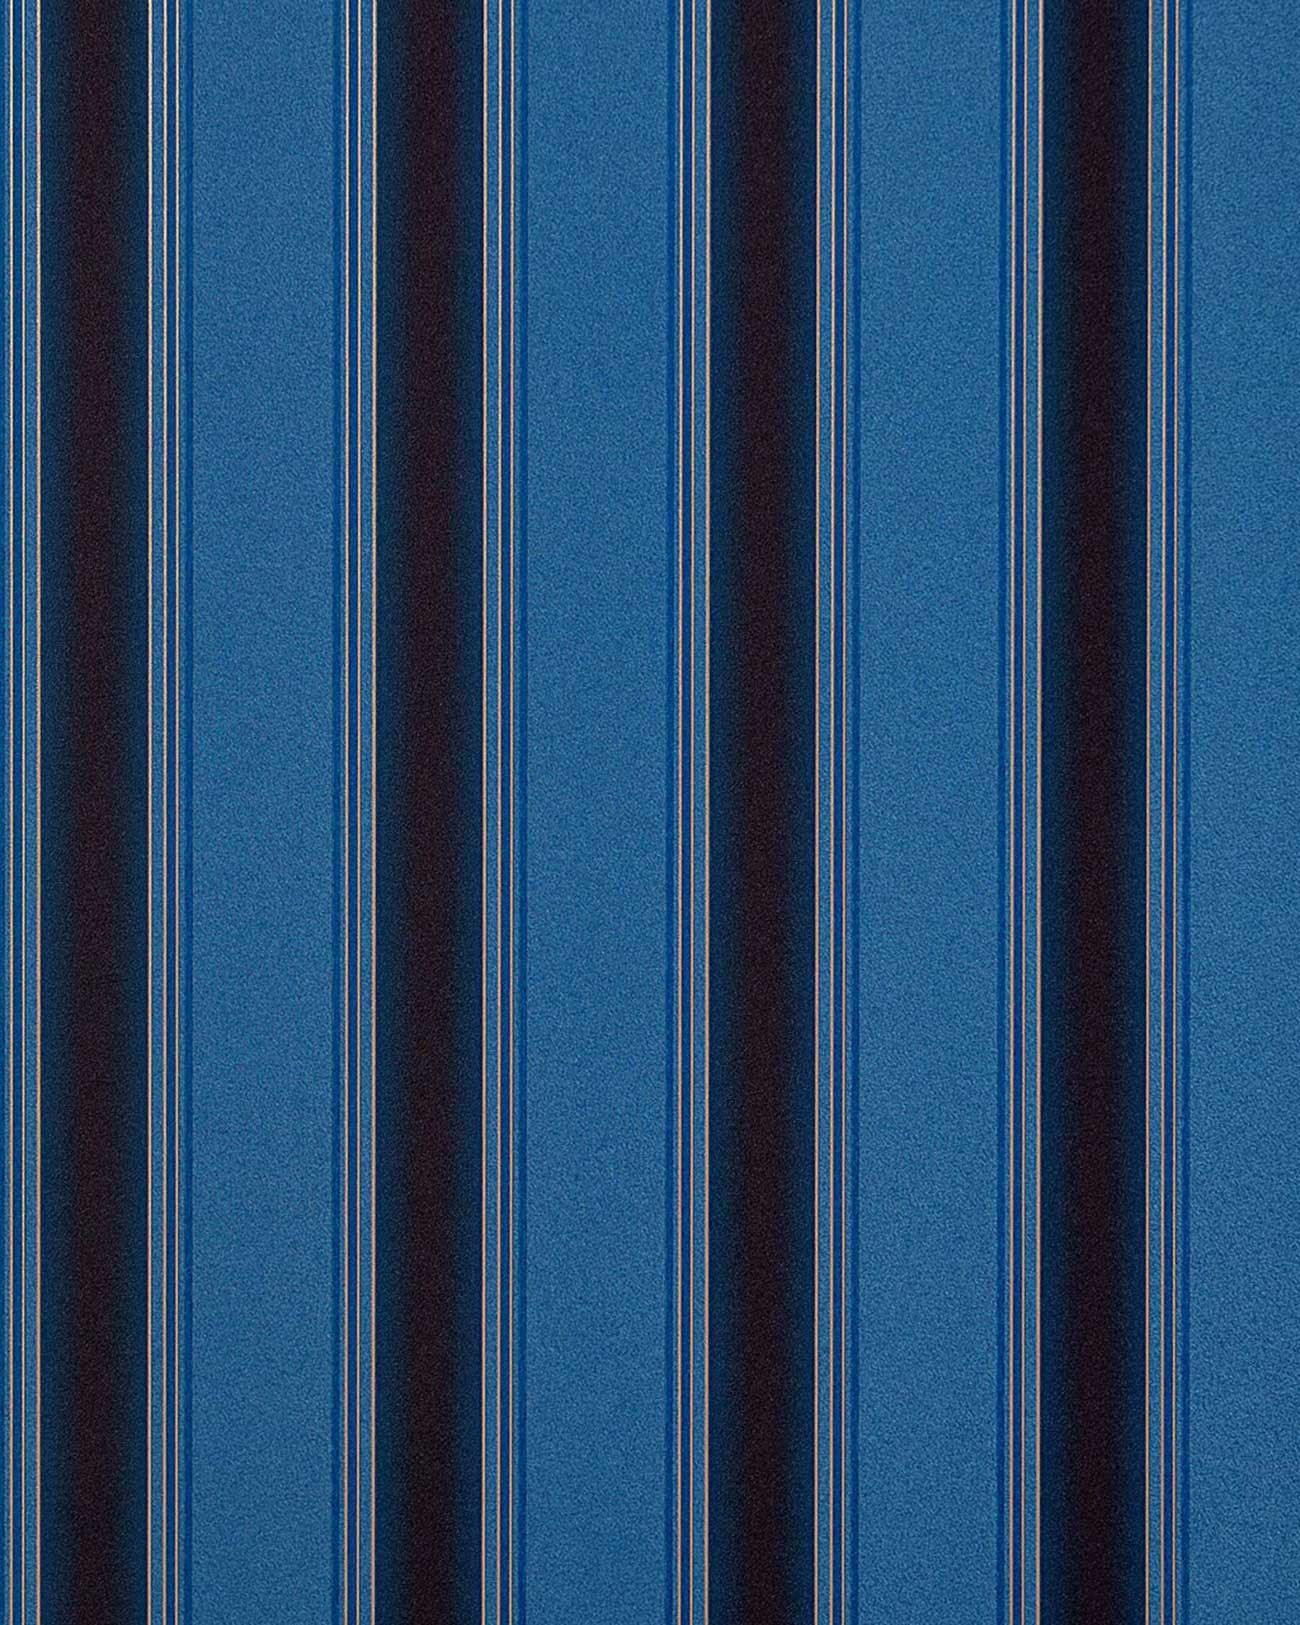 edem 827 24 tapete barock opulence streifen hell blau blau braun silber 70 cm ebay. Black Bedroom Furniture Sets. Home Design Ideas